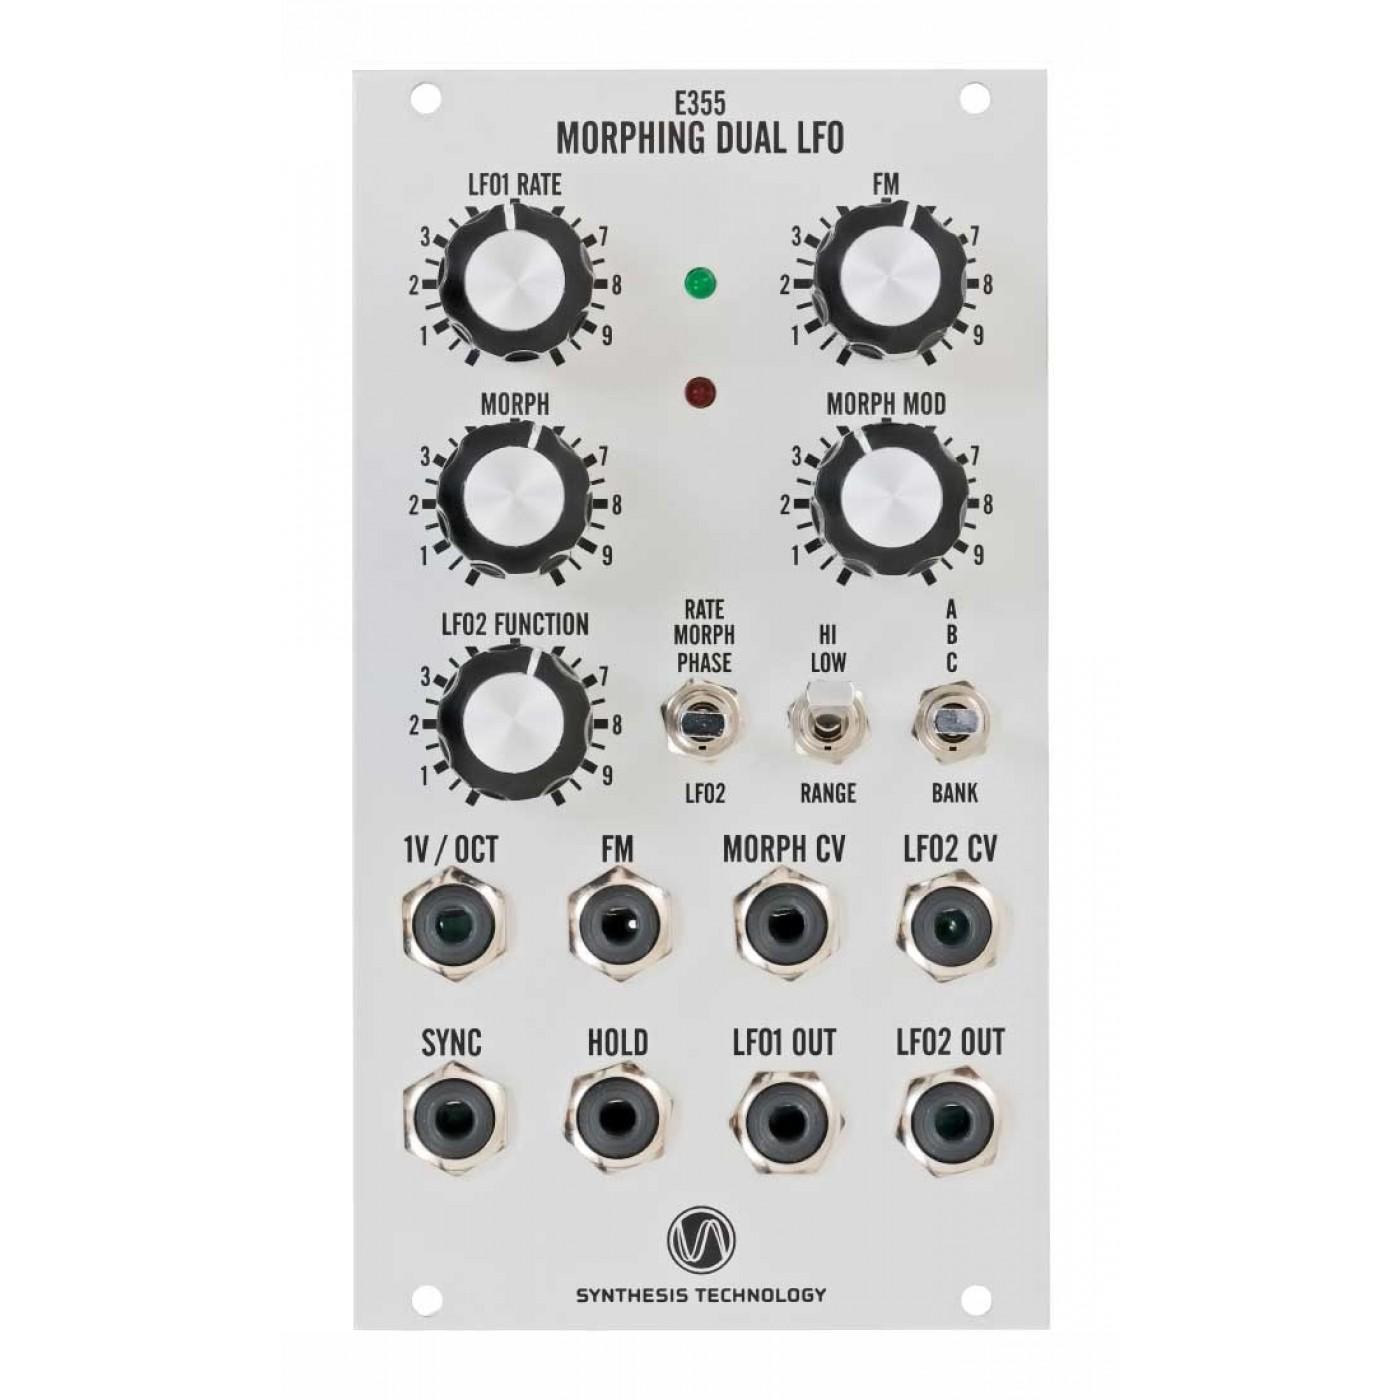 Synthesis Technology E355 Dual LFO